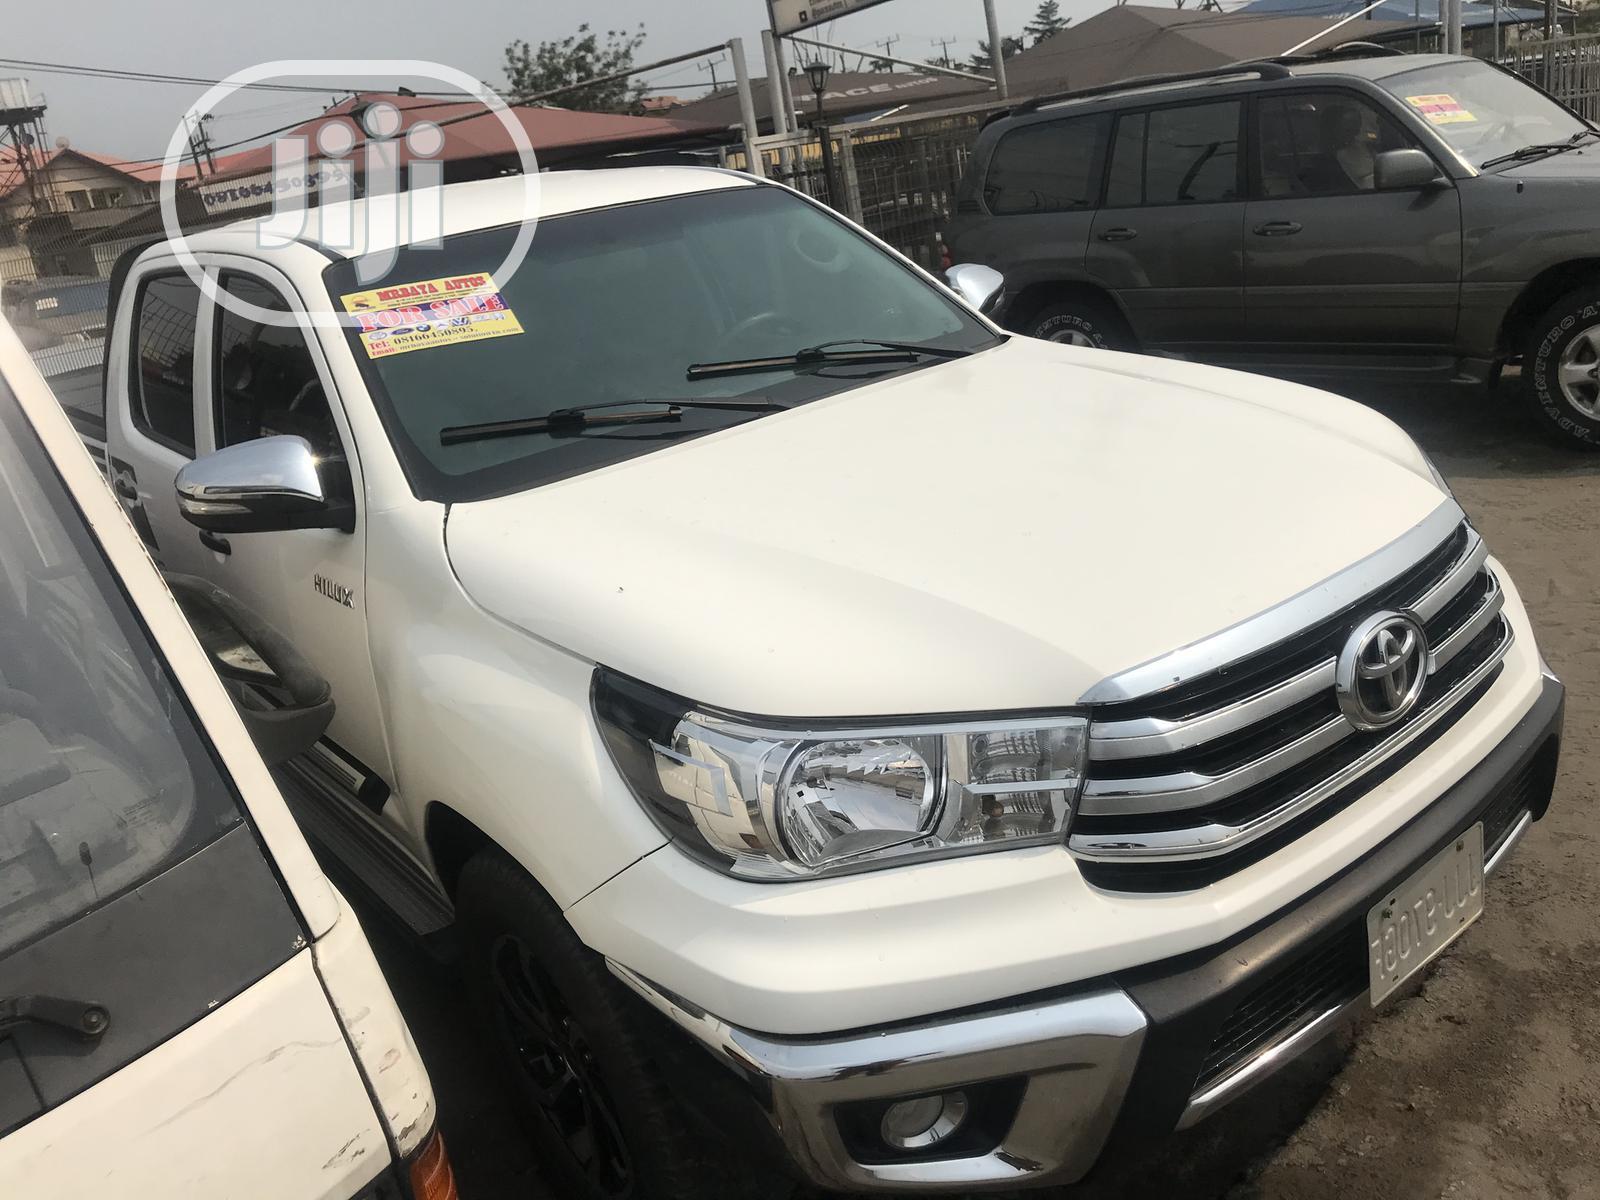 Toyota Hilux 2017 TRD White 4x4 White